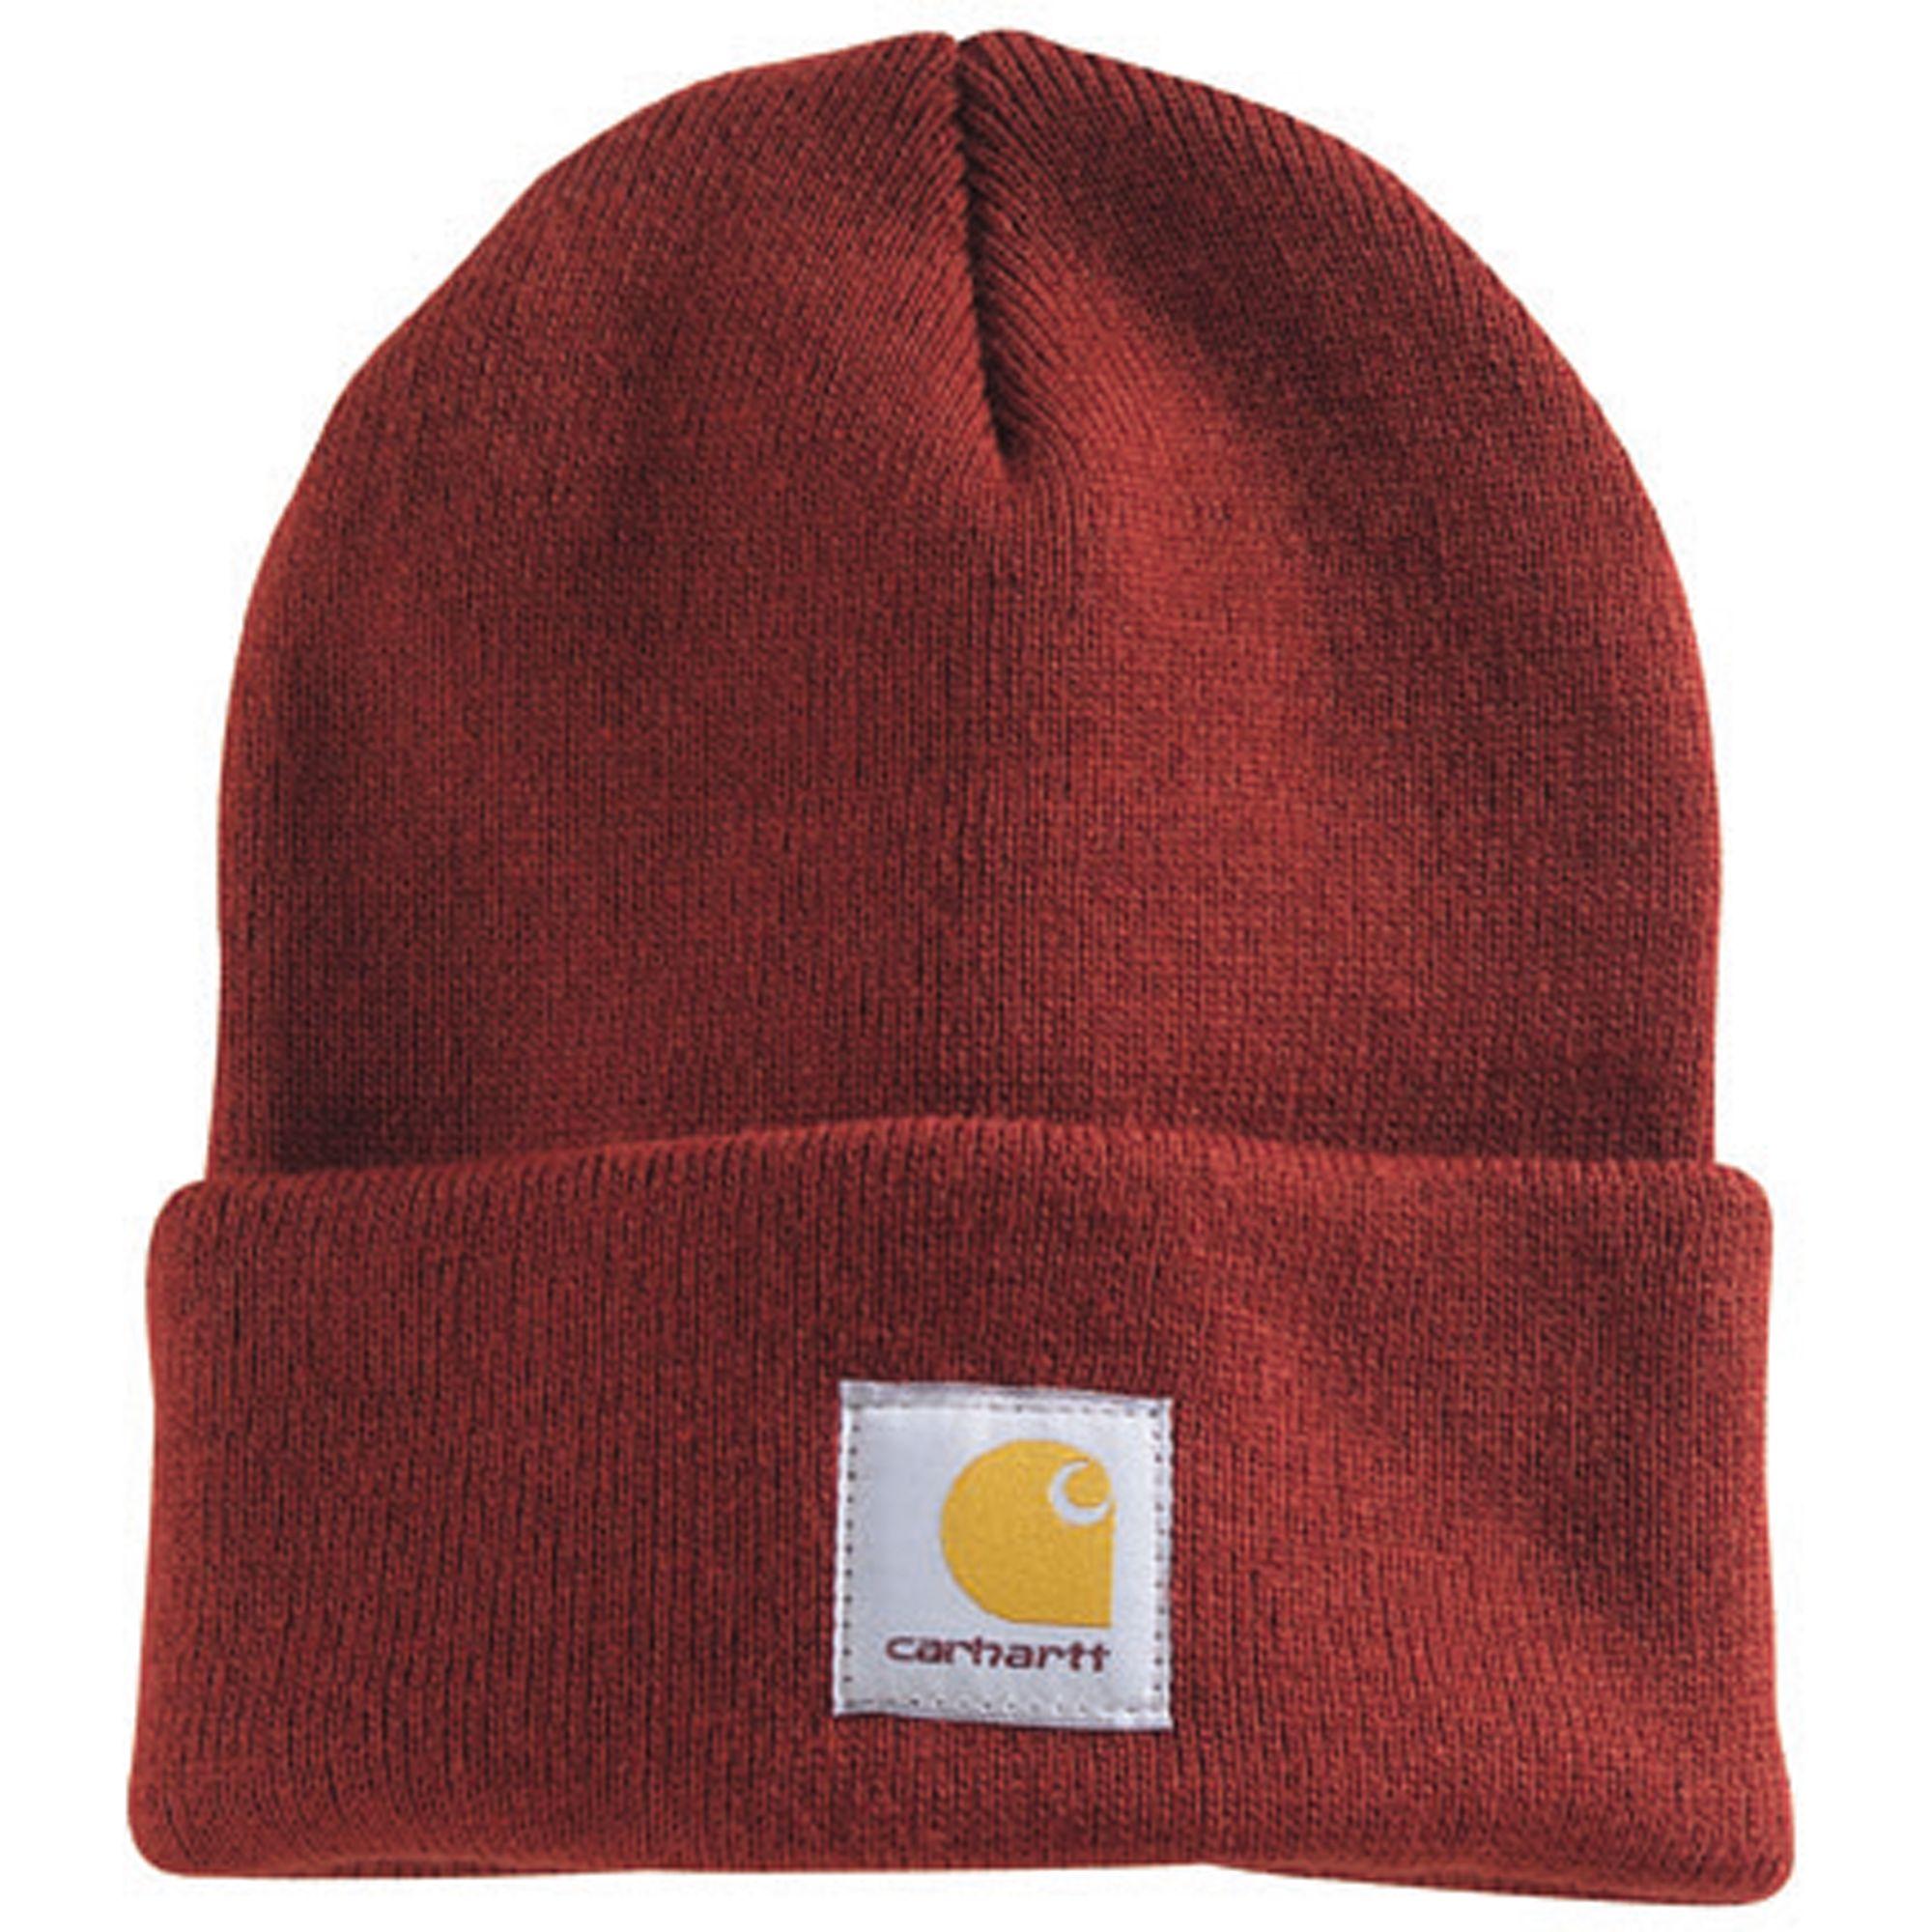 Carhartt - Product - Acrylic Watch Hat